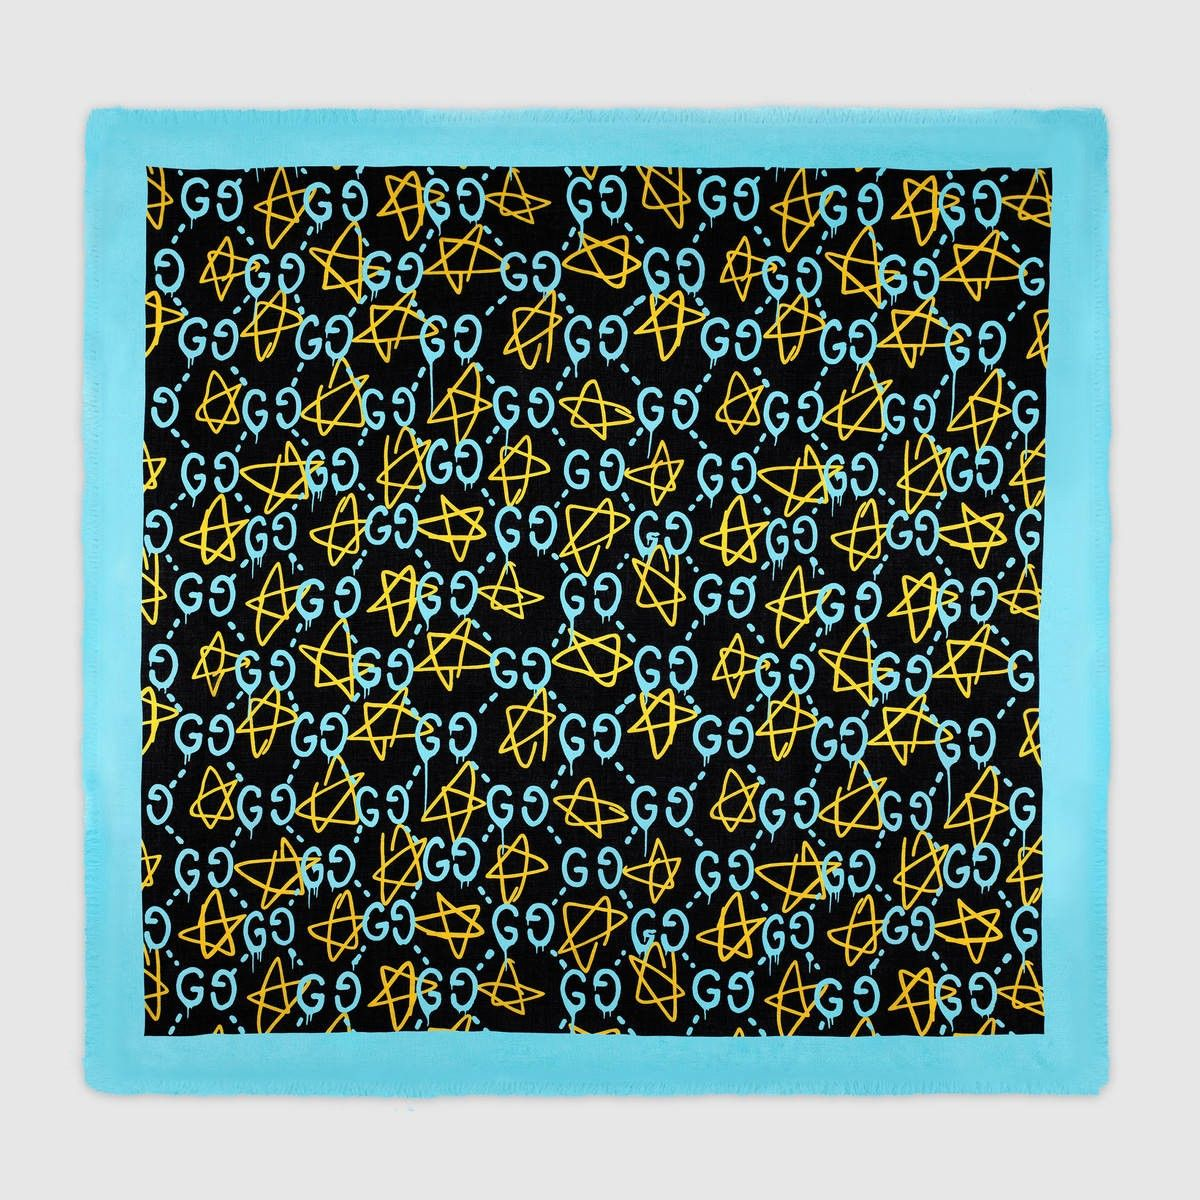 a8a59cb50be GUCCI GucciGhost shawl - blue GucciGhost print.  gucci